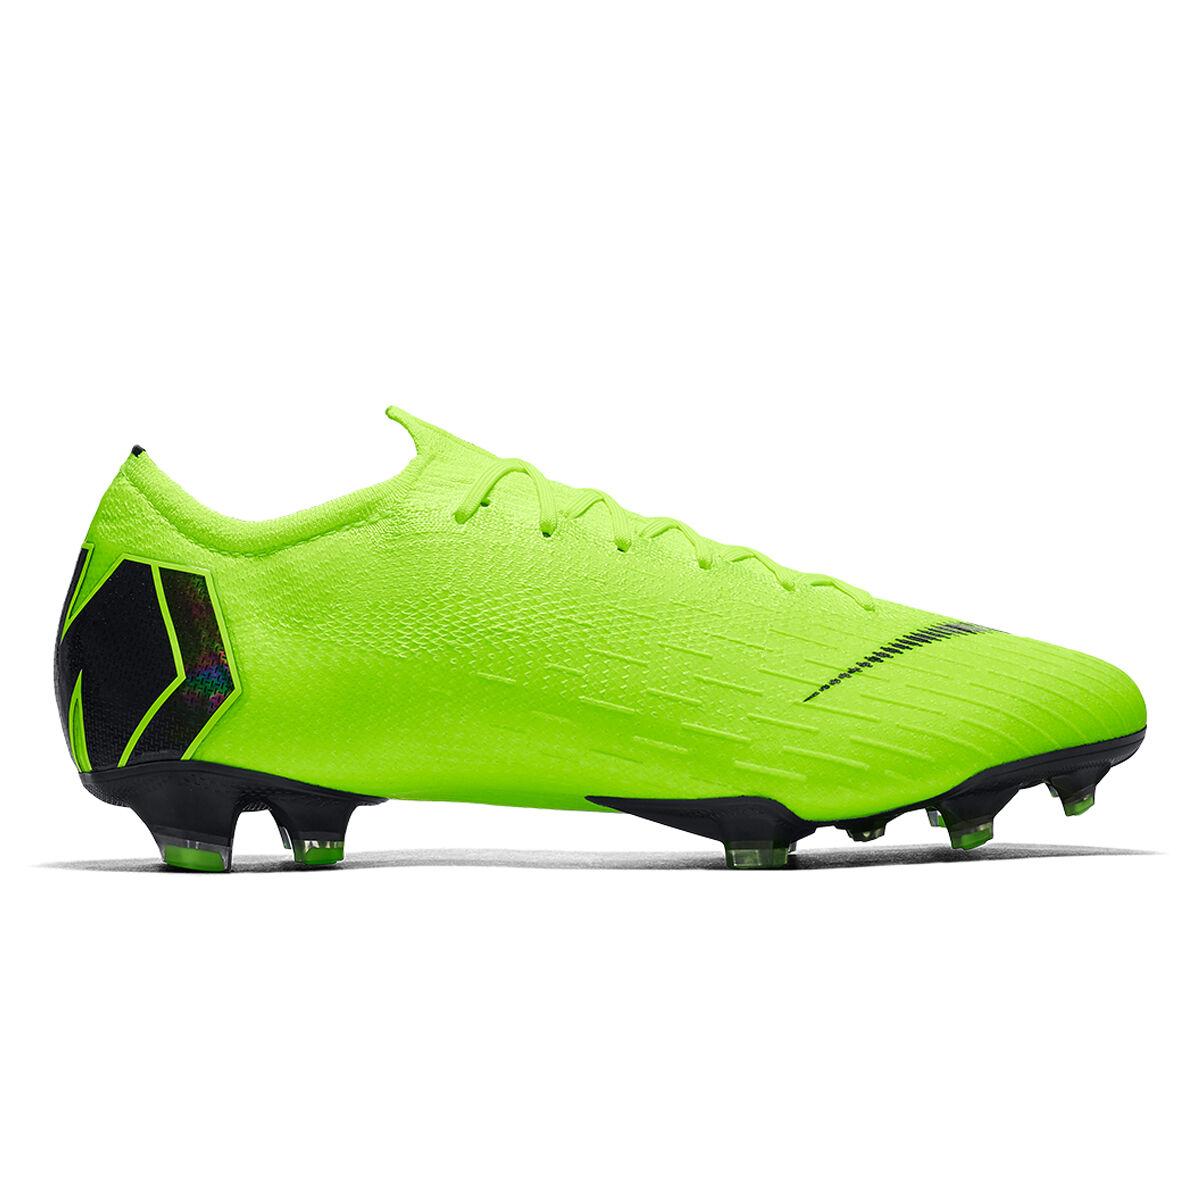 Nike Mercurial Vapor XII Elite FG Men′s Nike Football Shoes